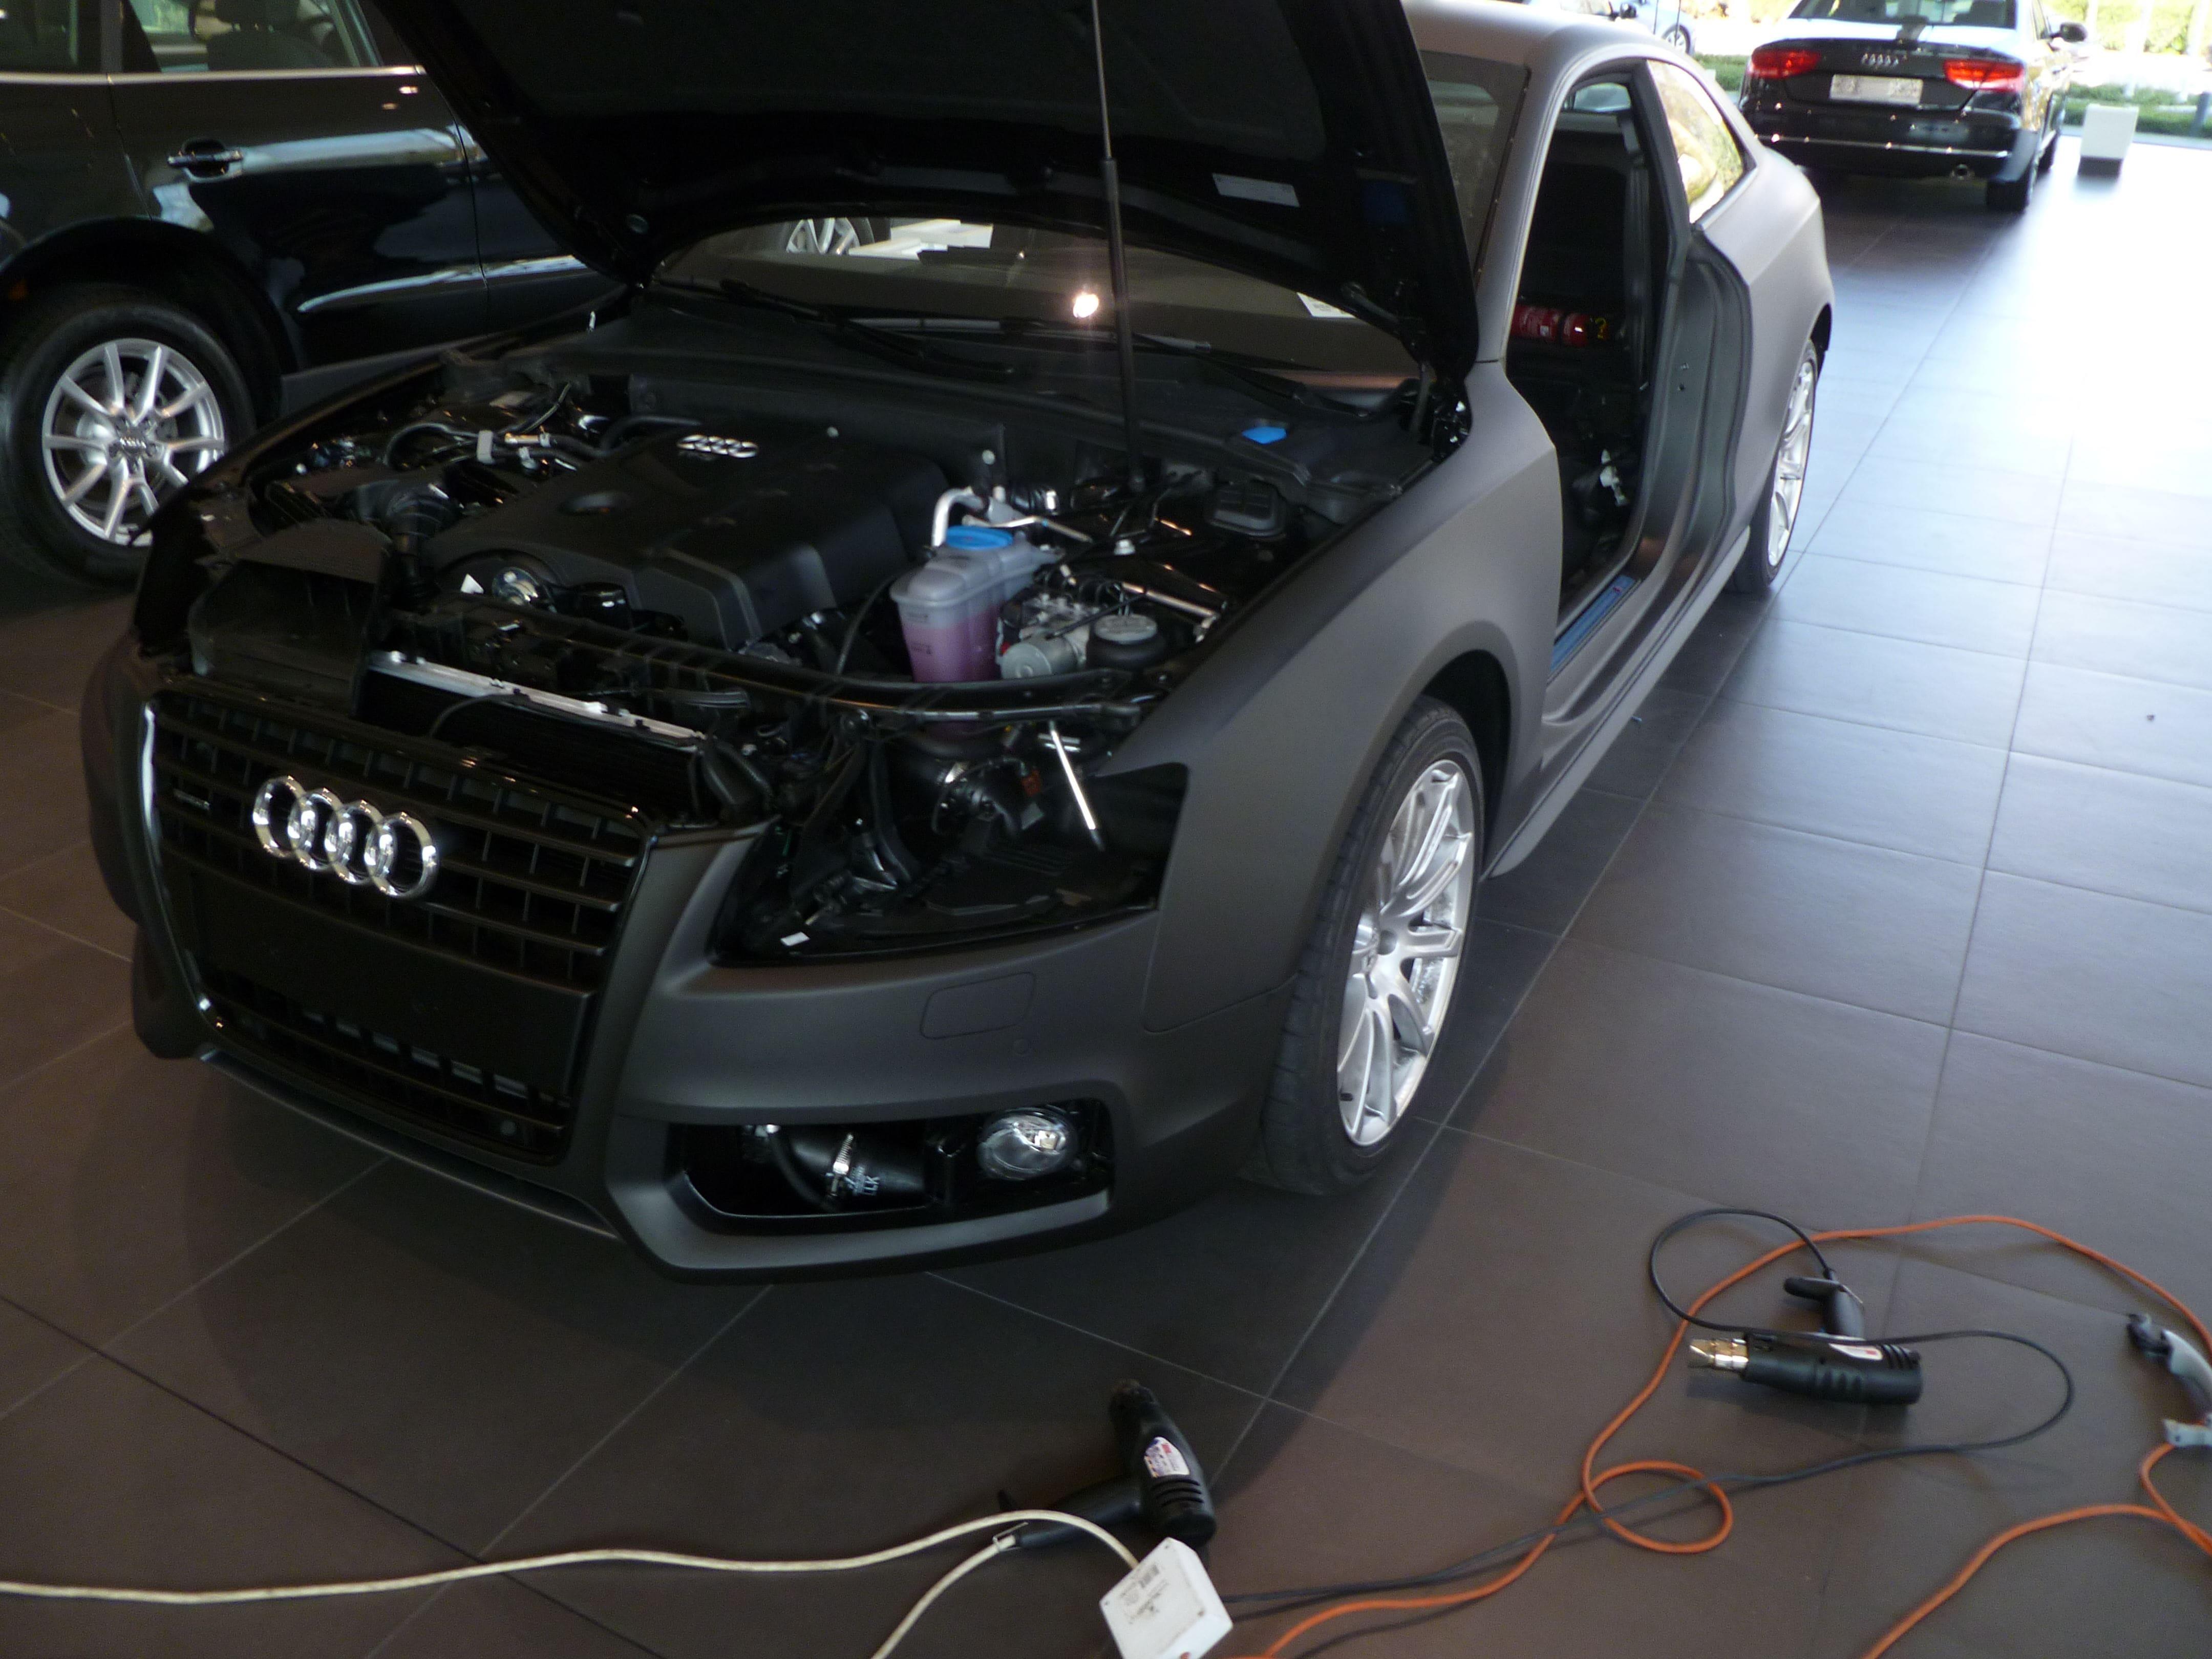 Audi A5 Coupe met Mat Zwarte Wrap, Carwrapping door Wrapmyride.nu Foto-nr:4641, ©2021